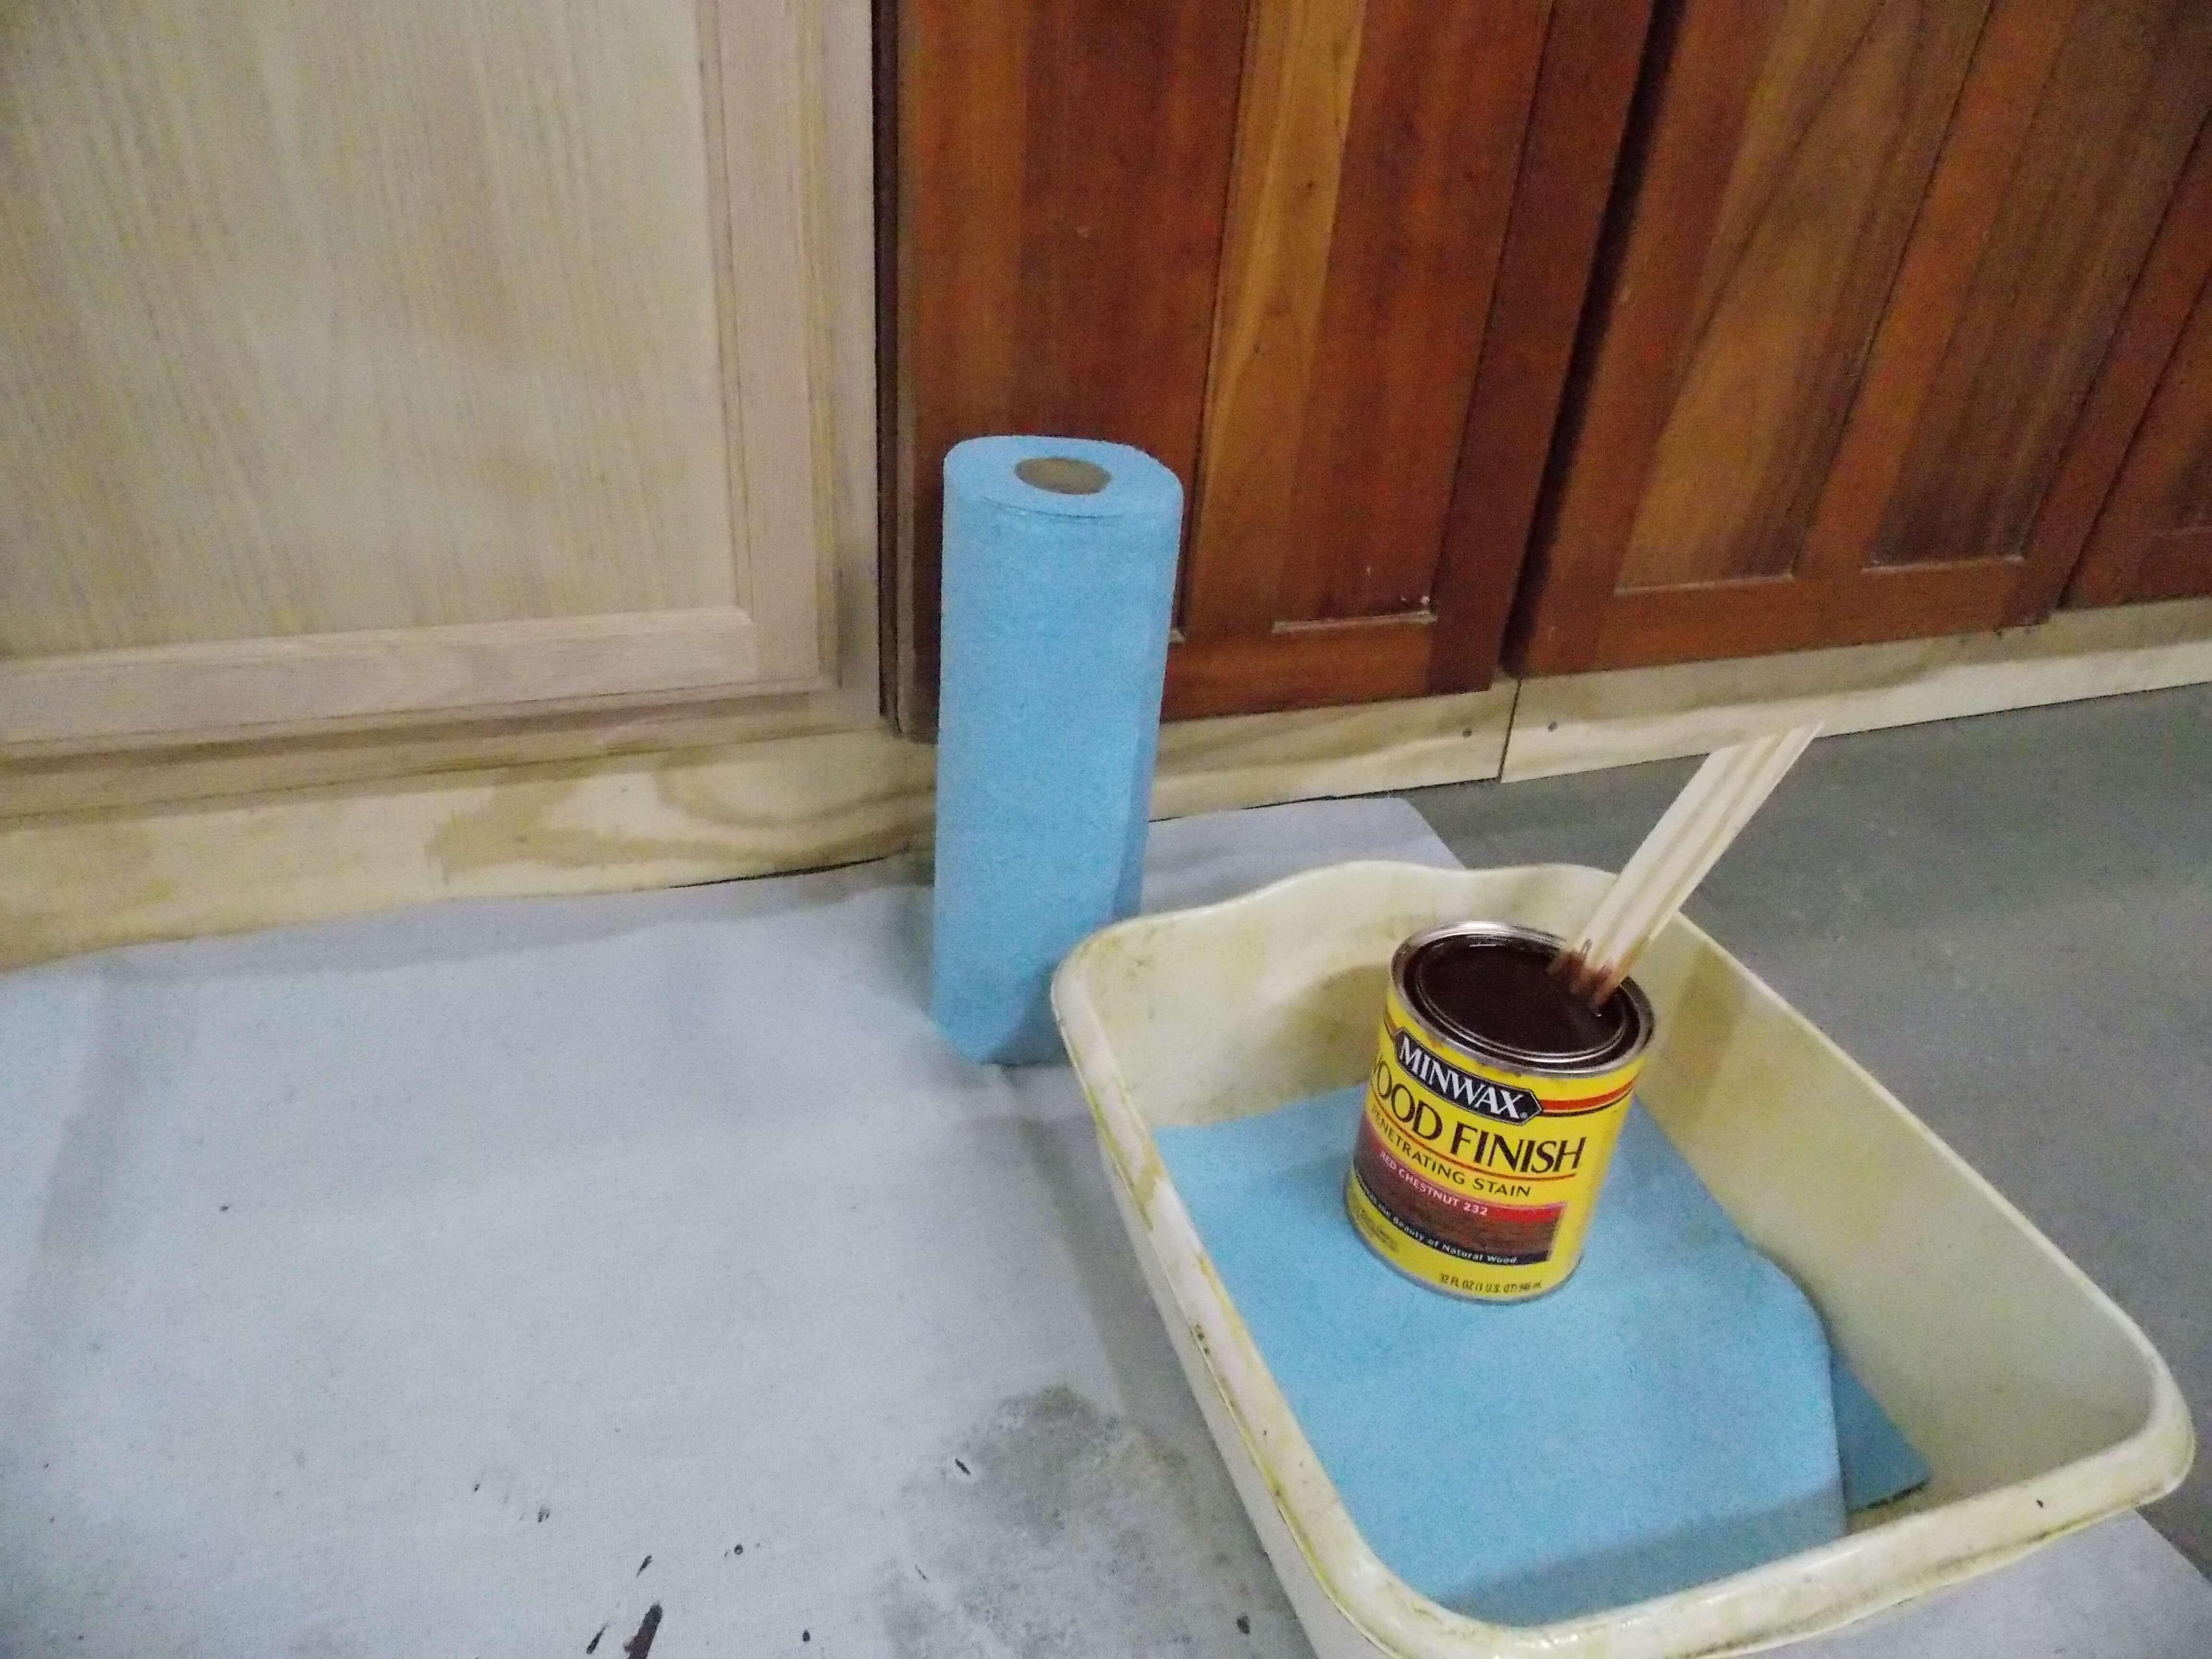 Preparing to apply Minwax wood finish to oak cabinets